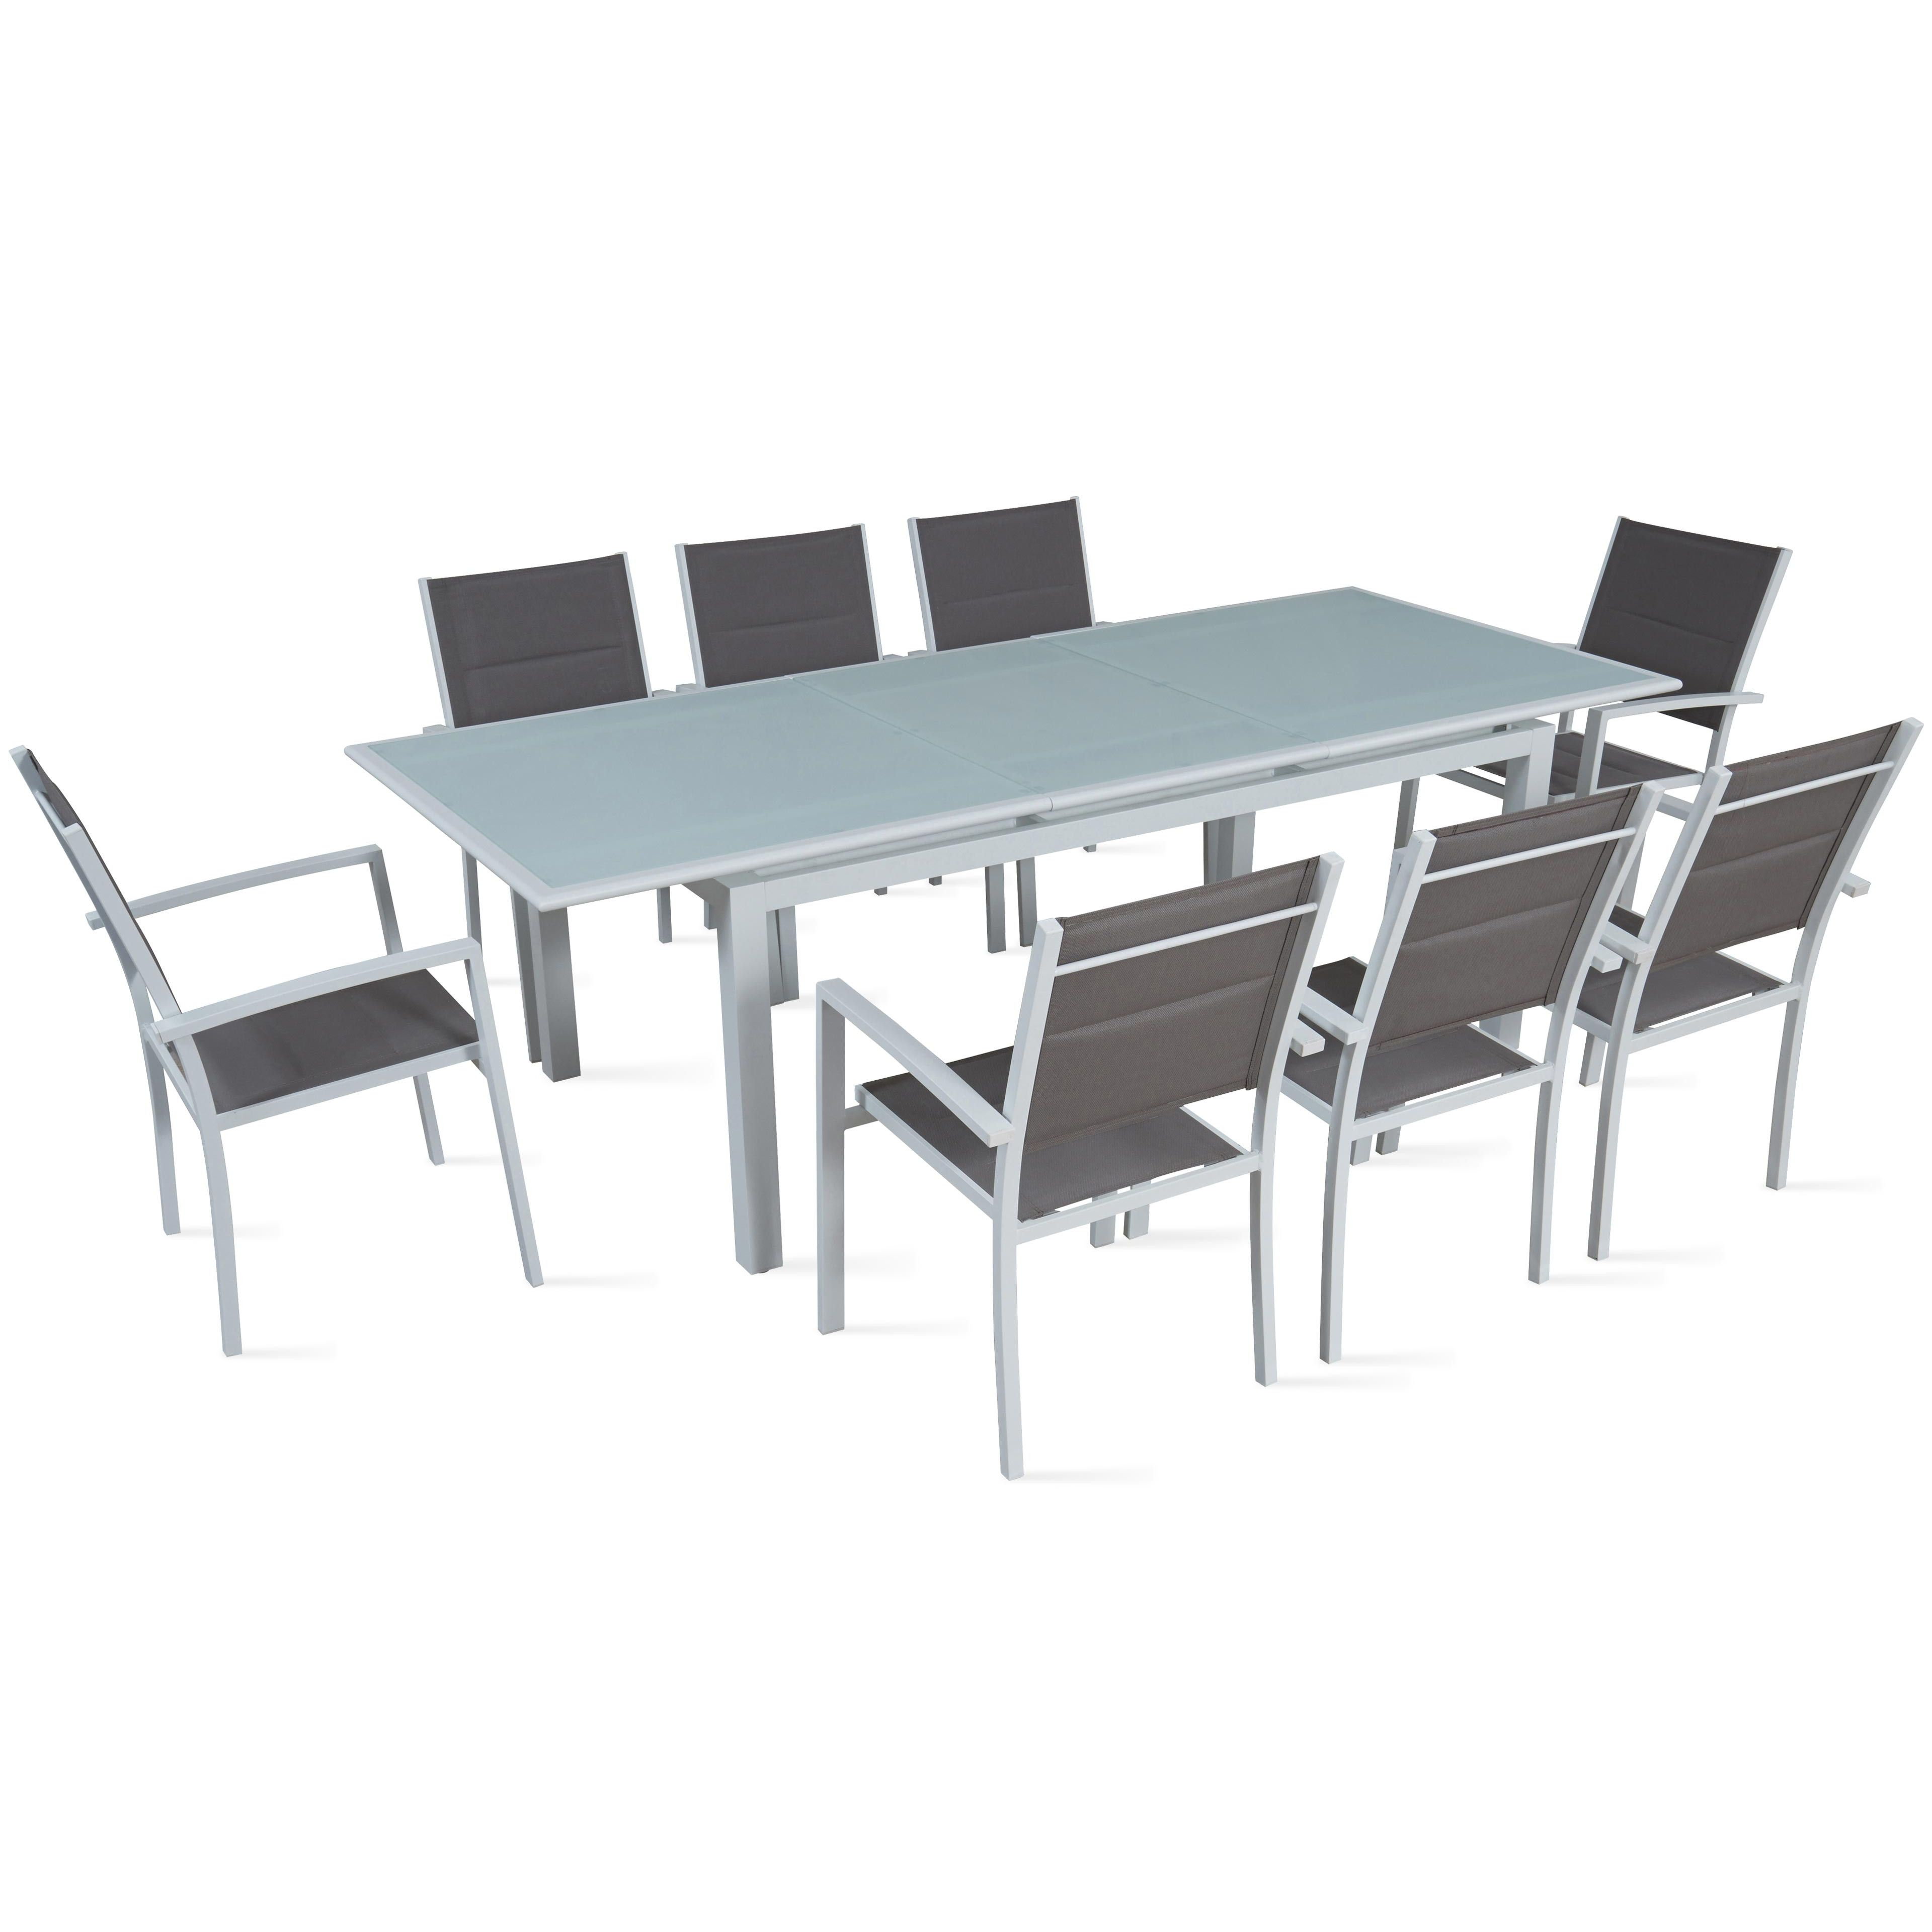 table de jardin rallonge 8 places. Black Bedroom Furniture Sets. Home Design Ideas